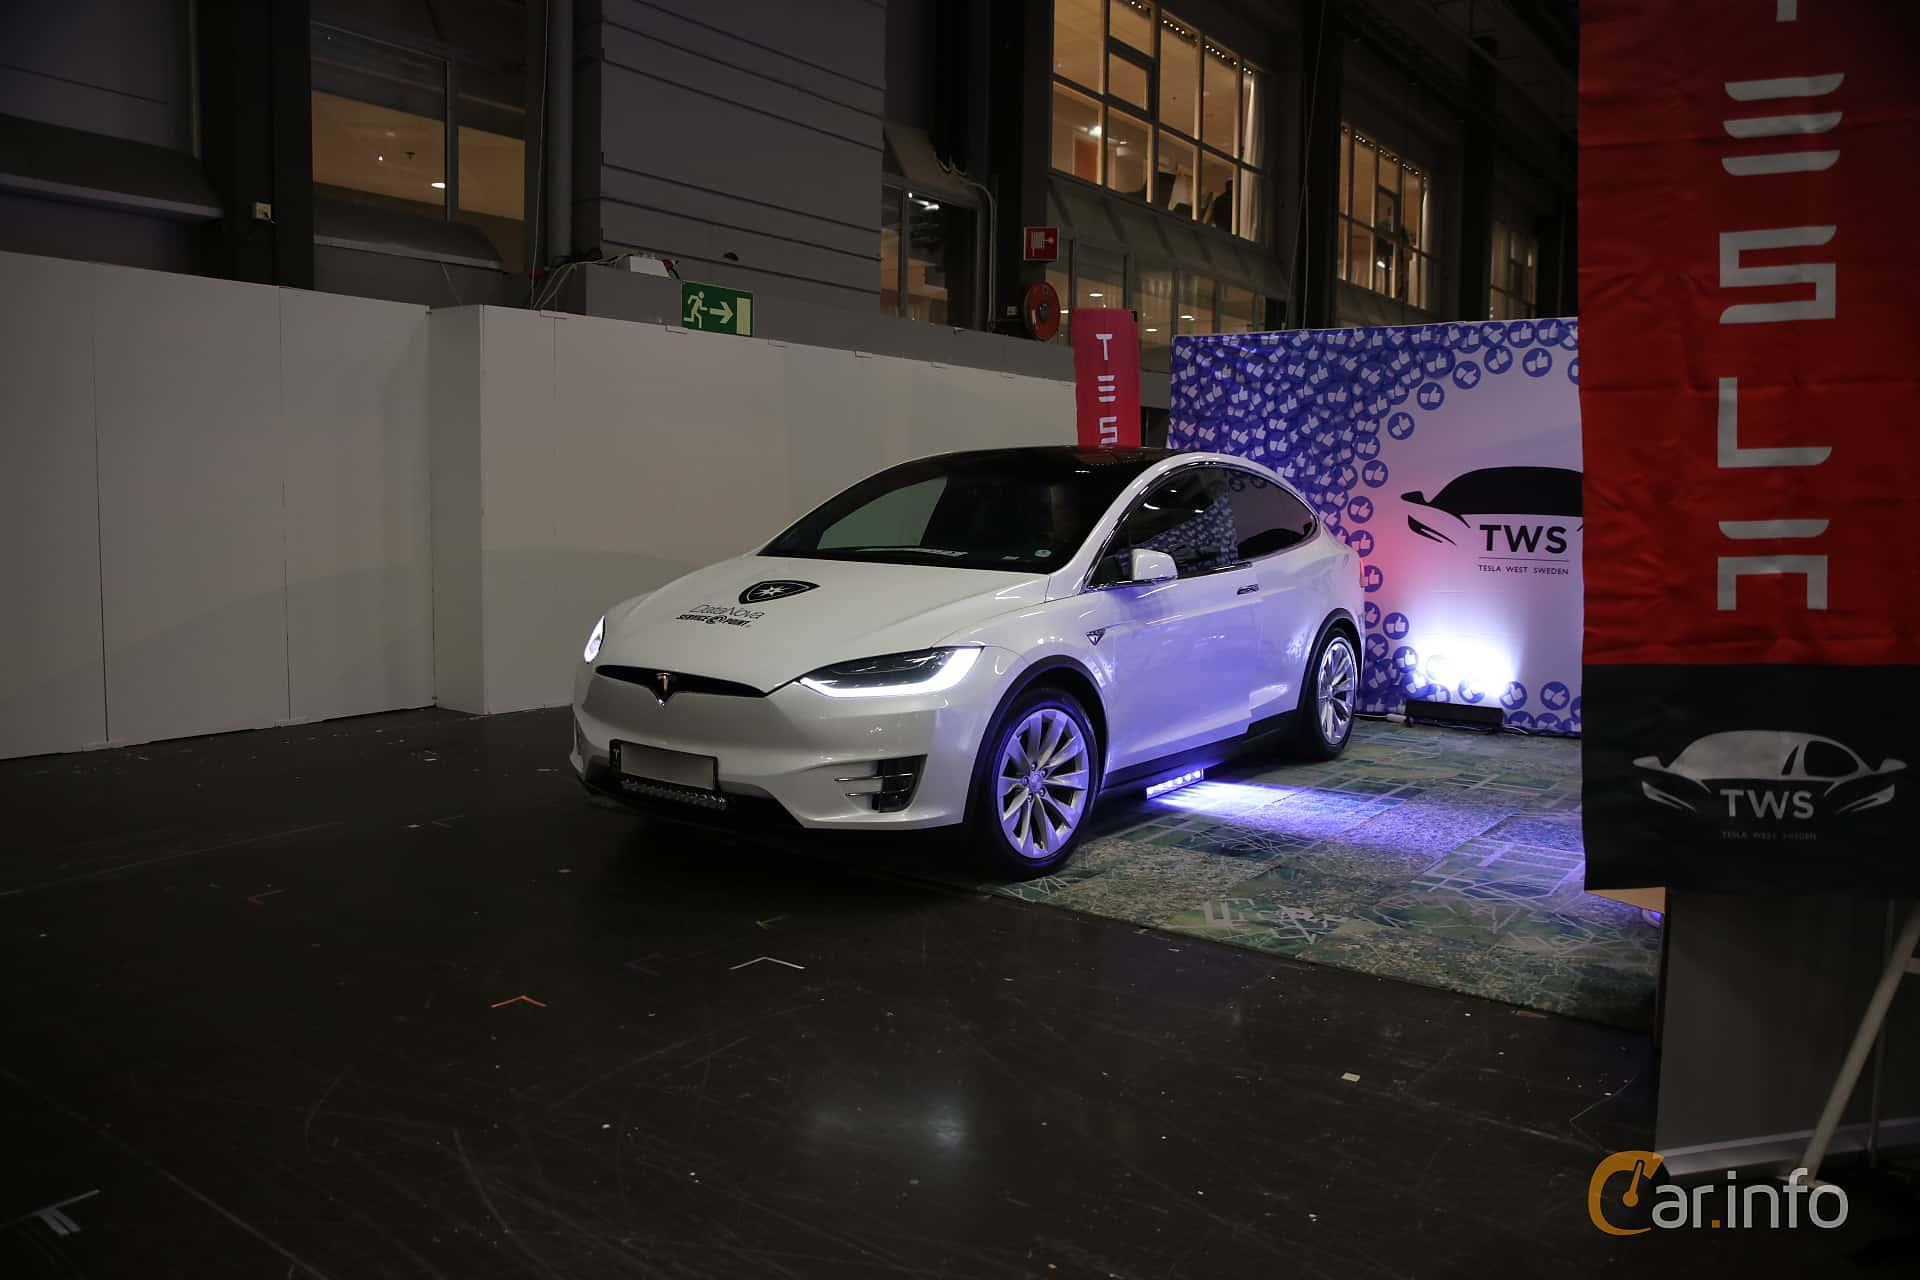 Tesla Model X 90D 90 kWh AWD Single Speed, 423hp, 2016 at eCar Expo Göteborg 2018